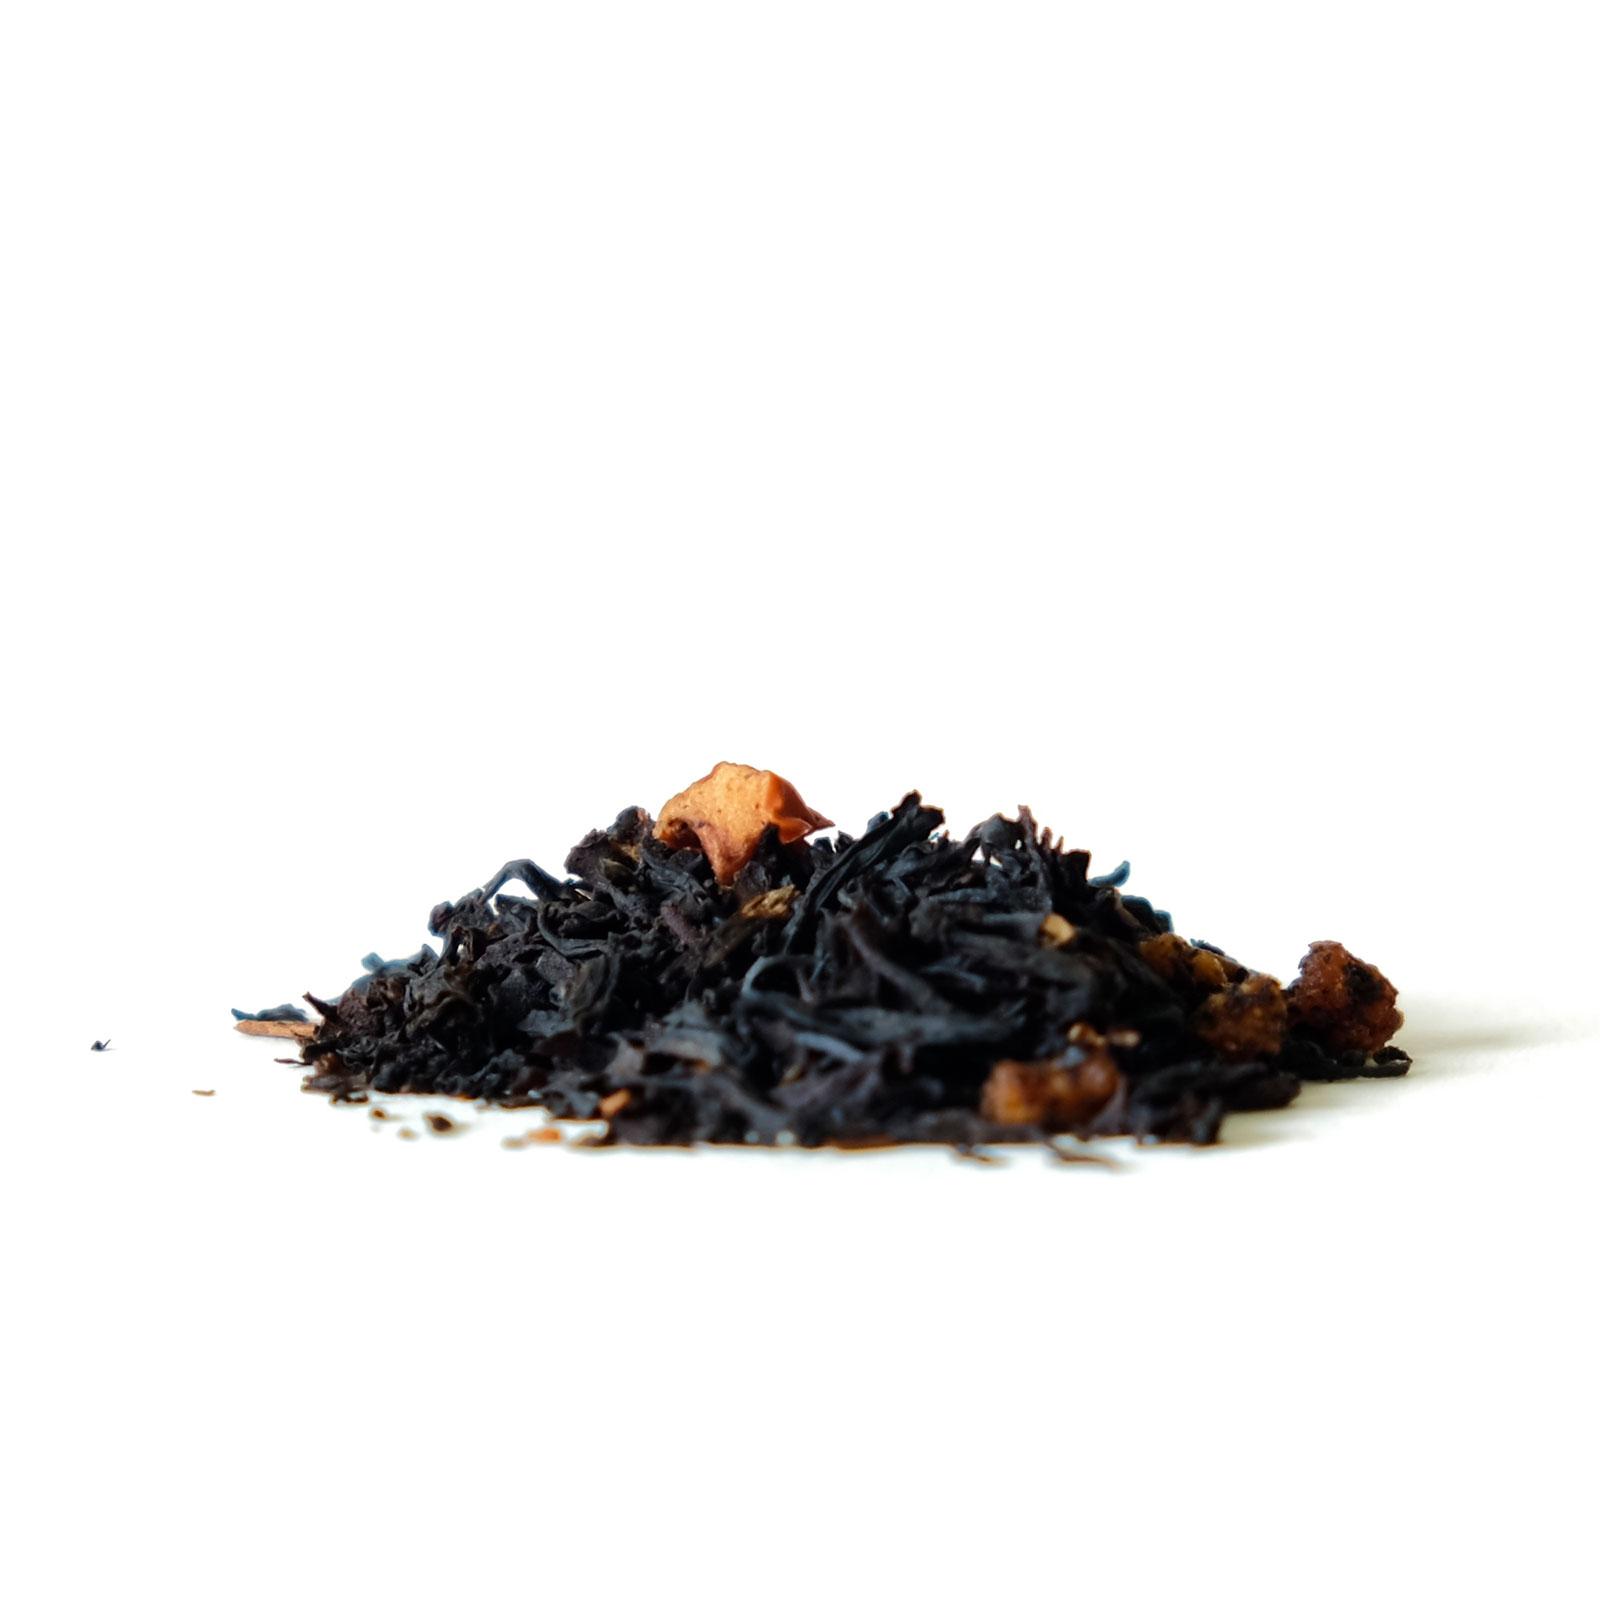 Thé noir saveur pomme caramélisée